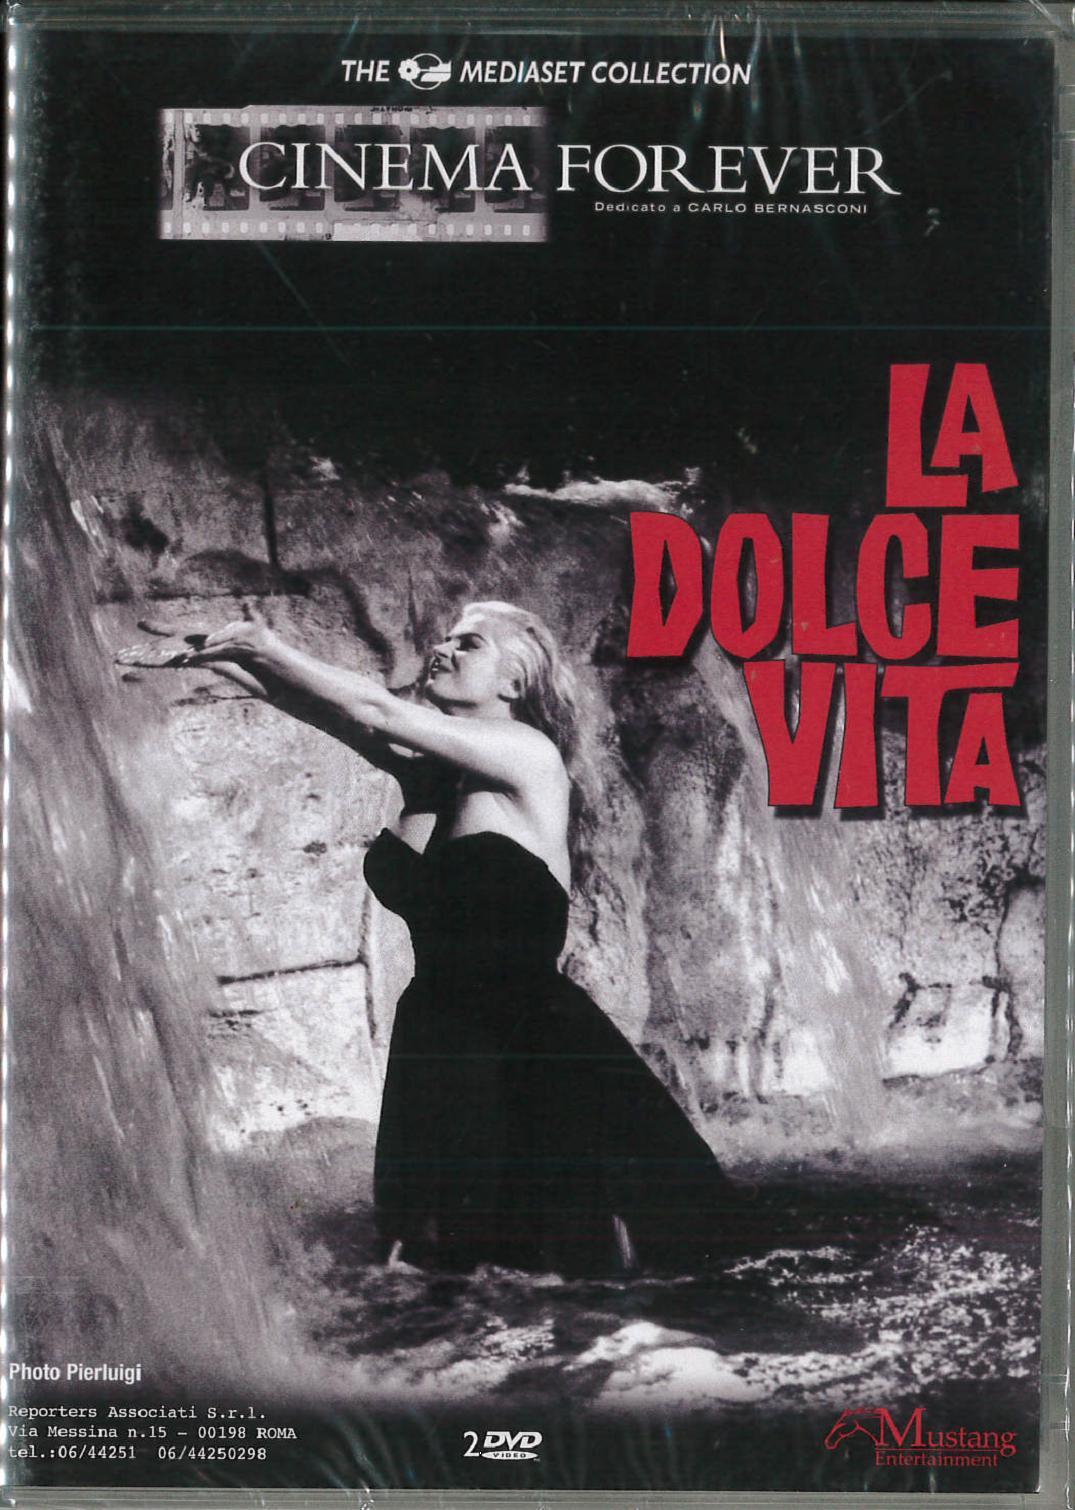 LA DOLCE VITA (CE) (2 DVD) (DVD)